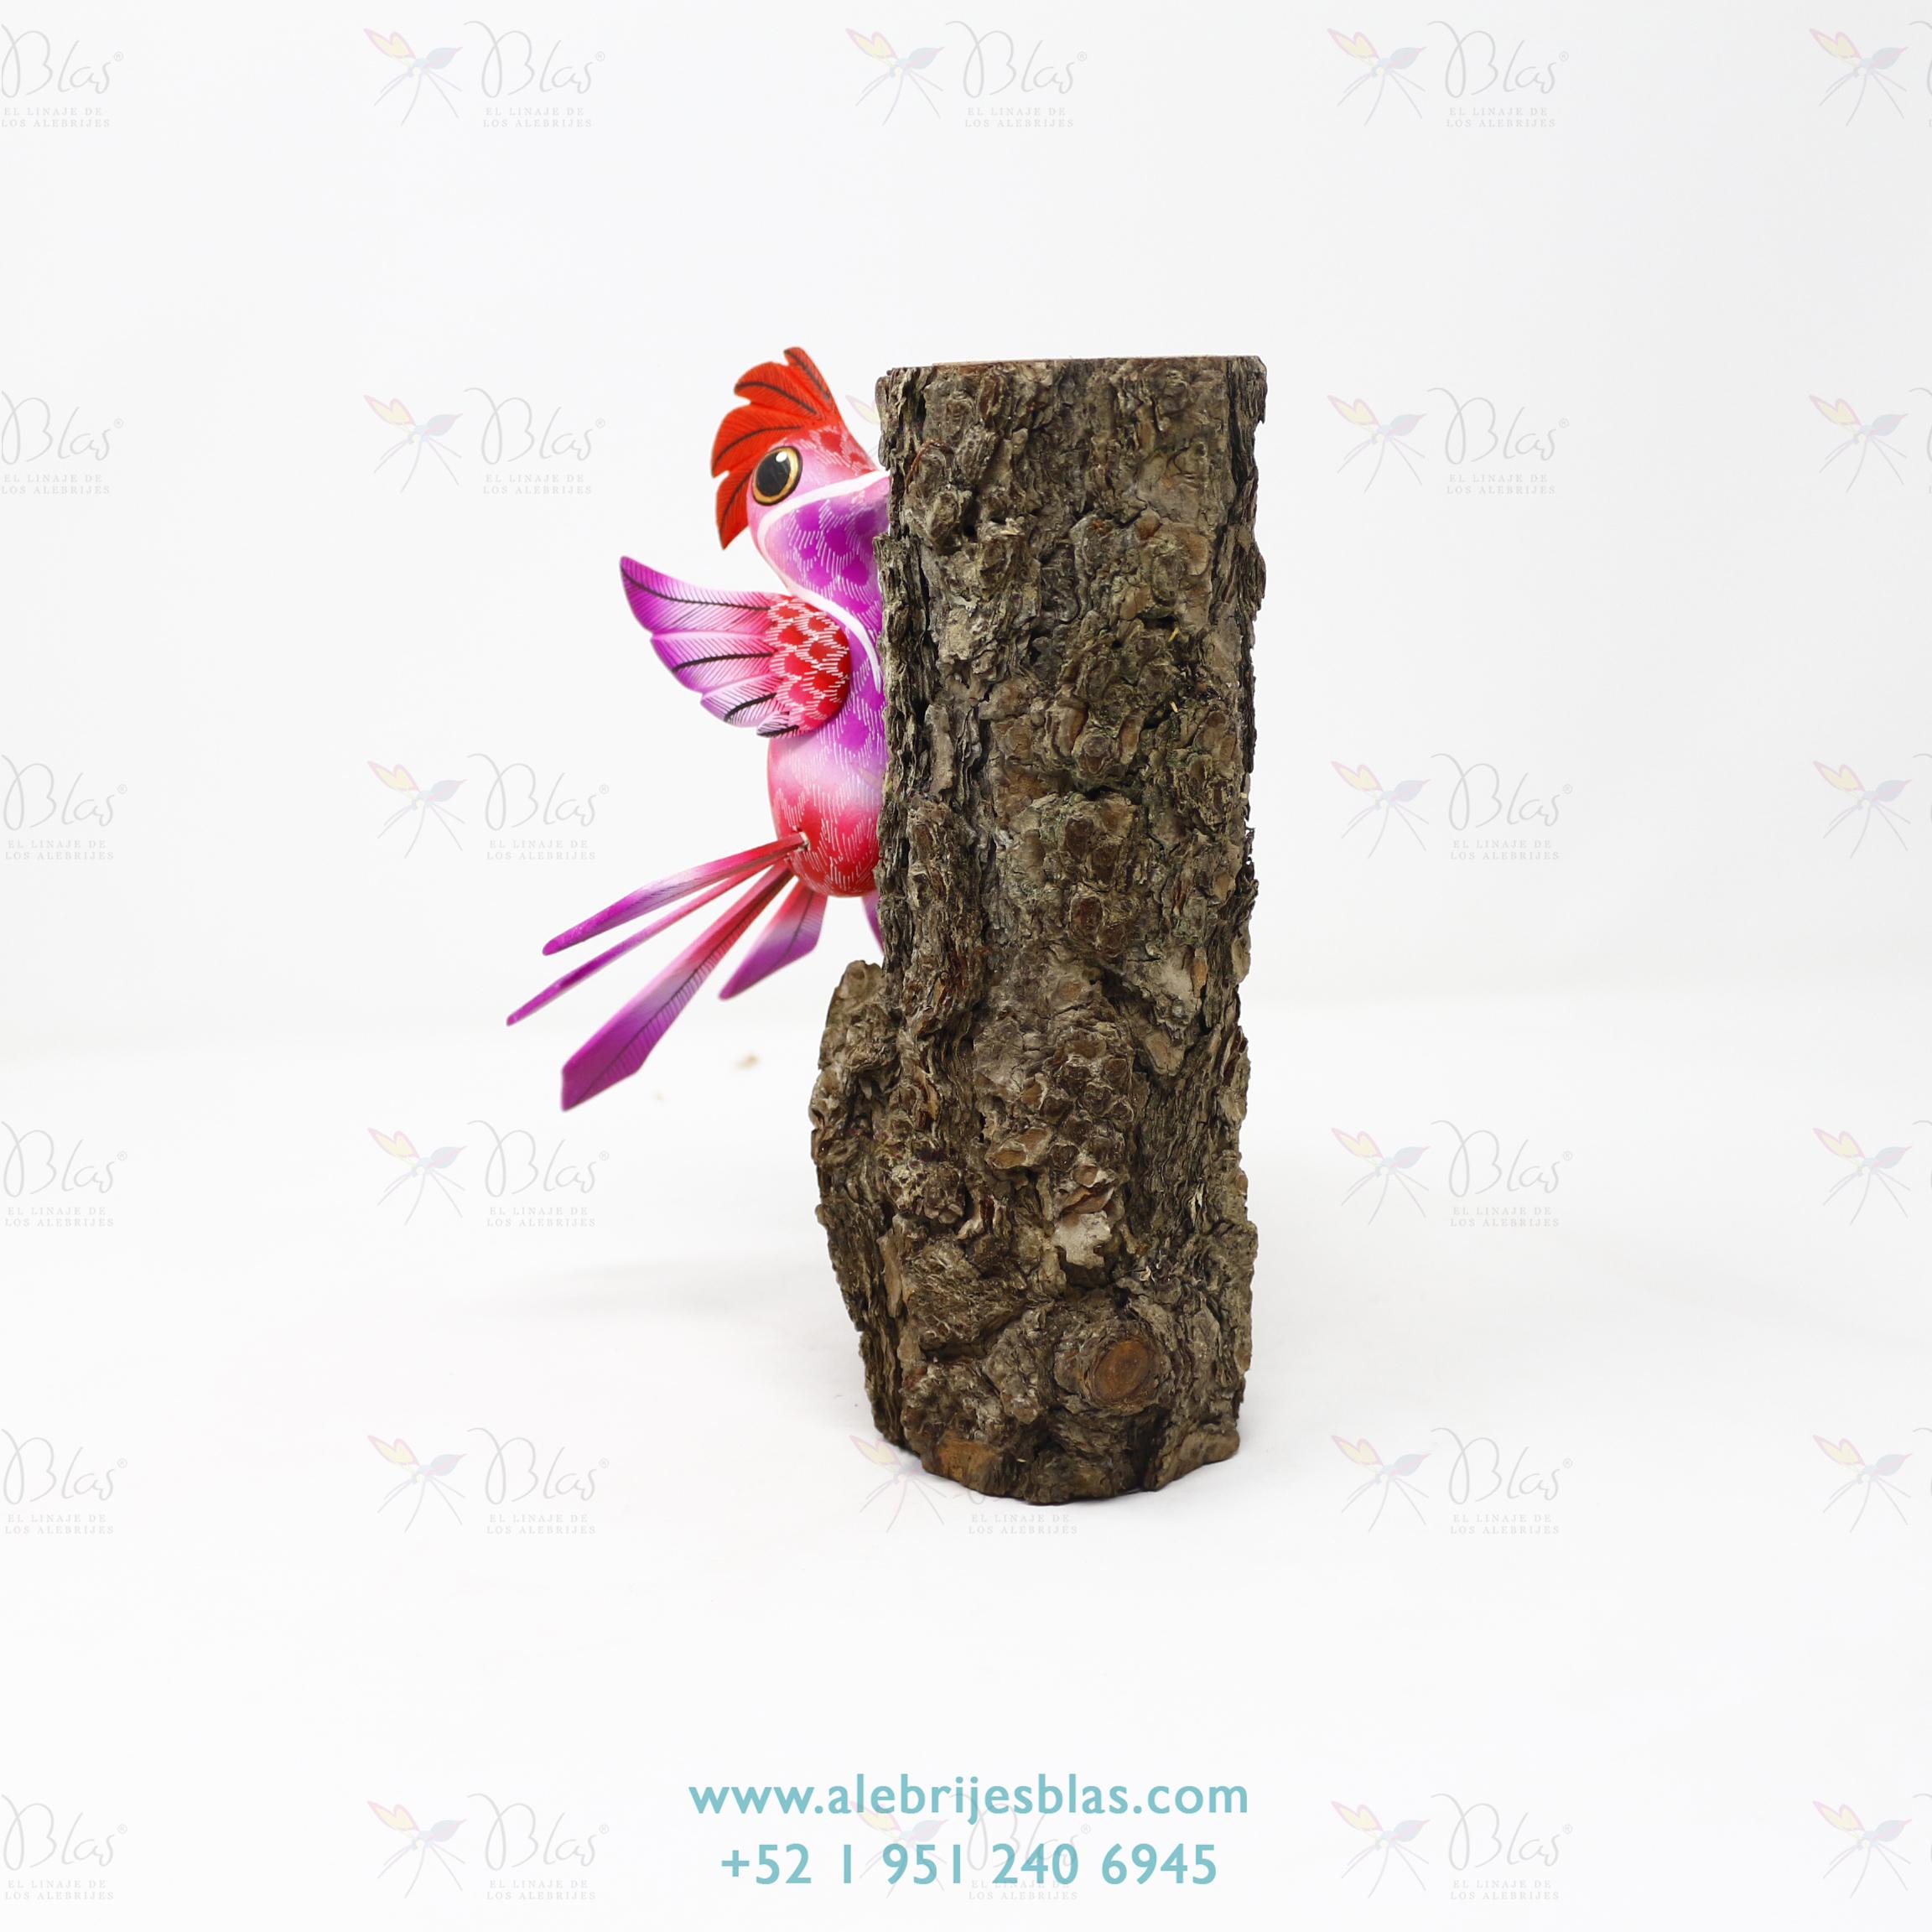 Wood Carving Art, Alebrije Pájaro Carpintero VI